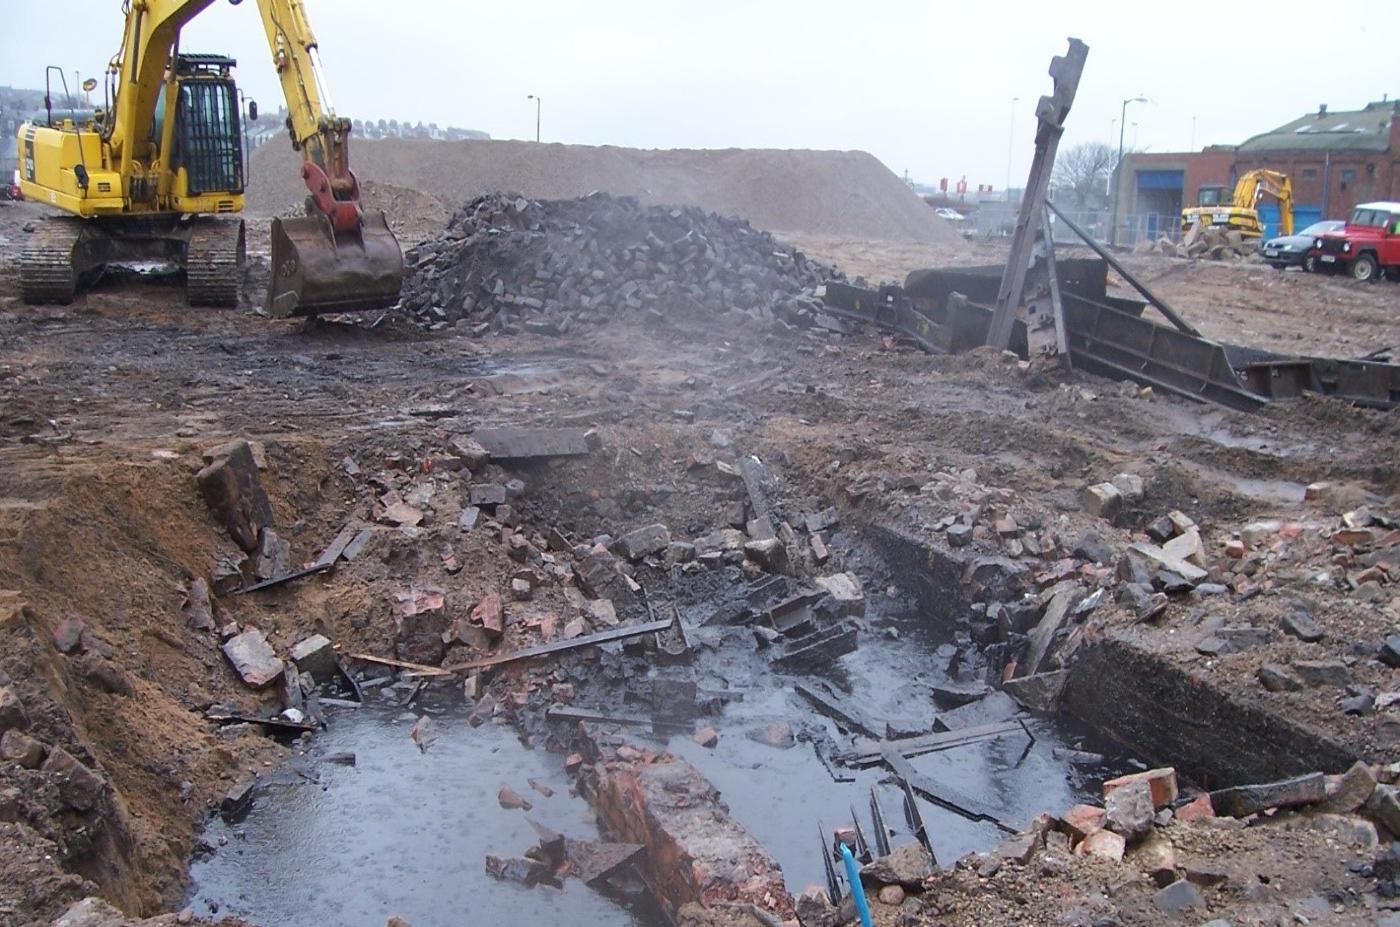 Building Regulations For Land Contamination